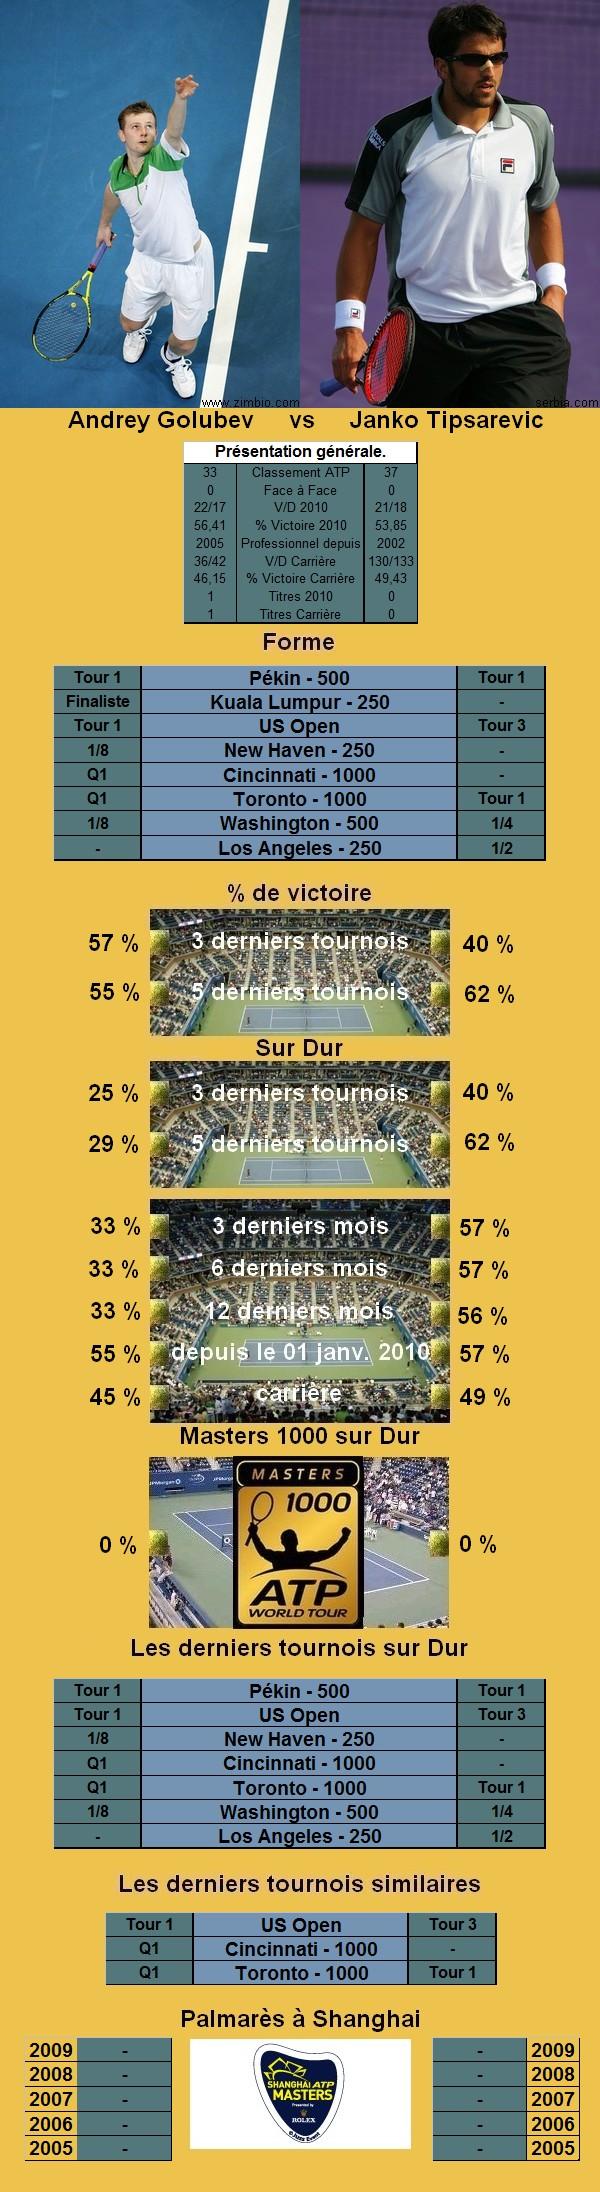 Statistiques tennis de Golubev contre Tipsarevic à Shanghai